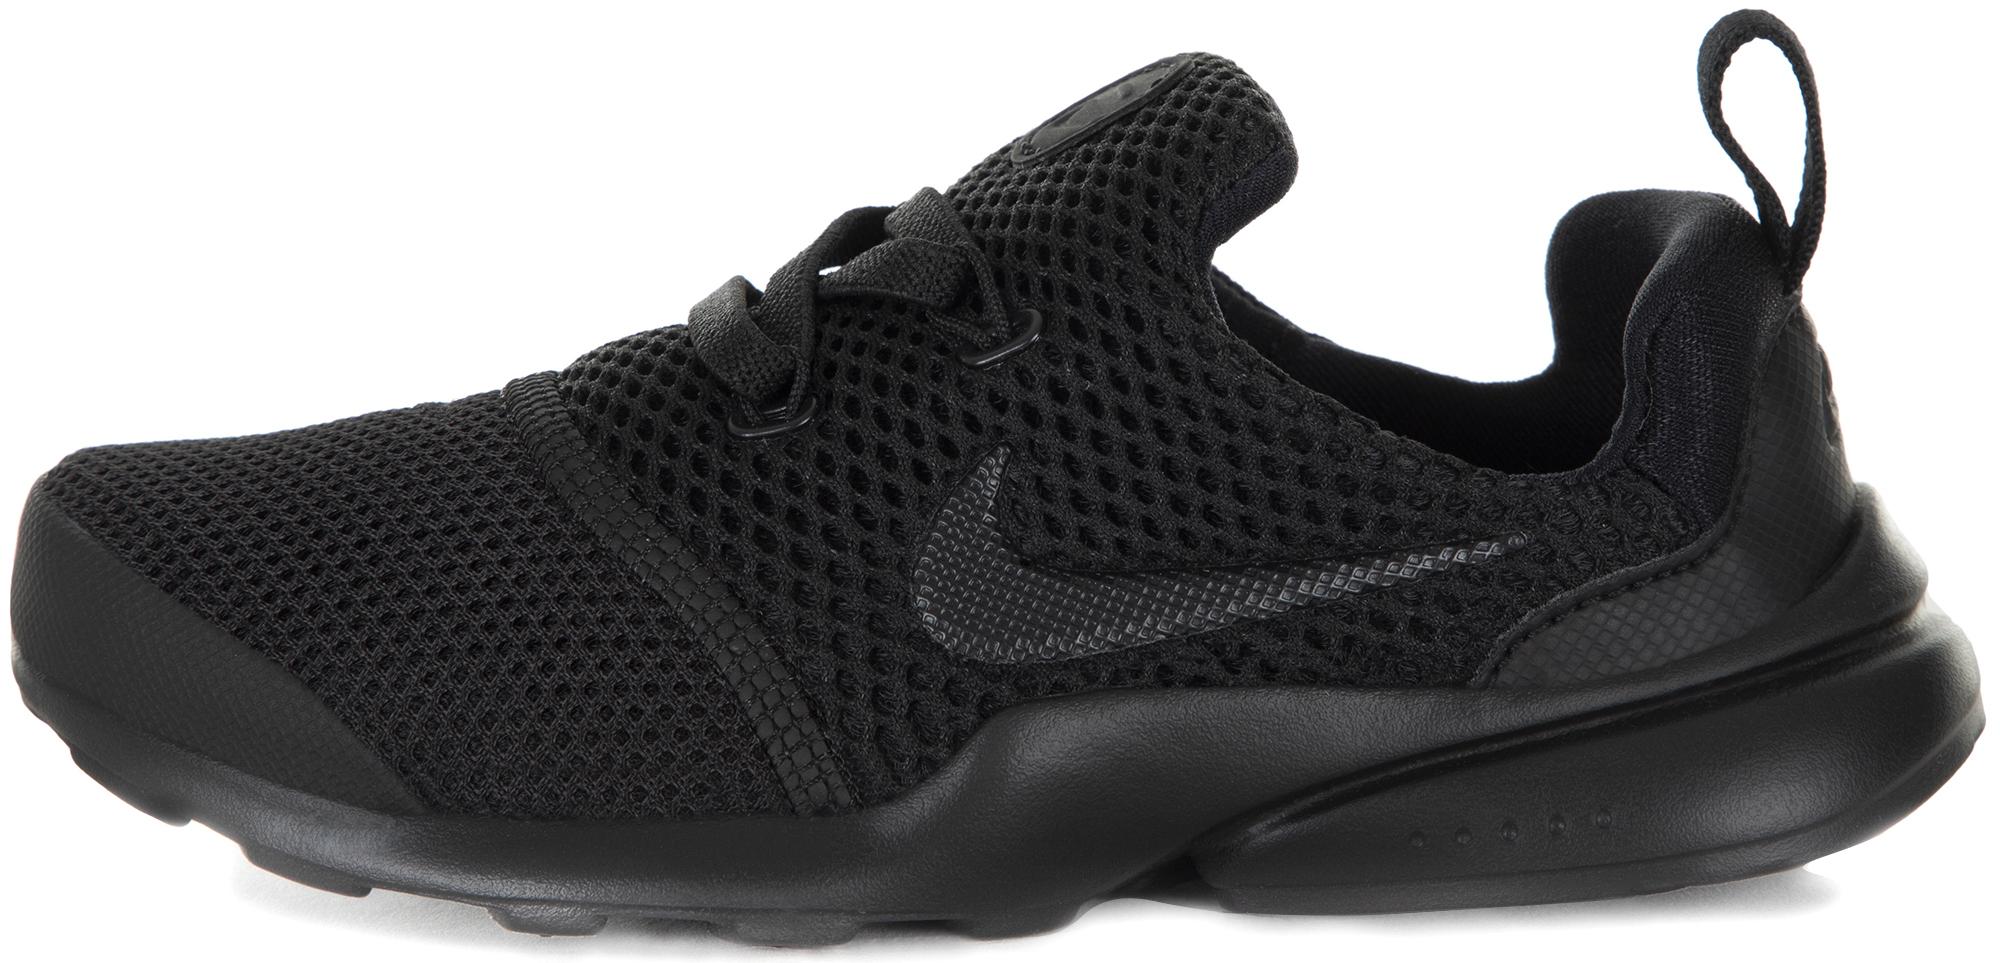 Nike Кроссовки для мальчиков Nike Presto Fly, размер 26 цена